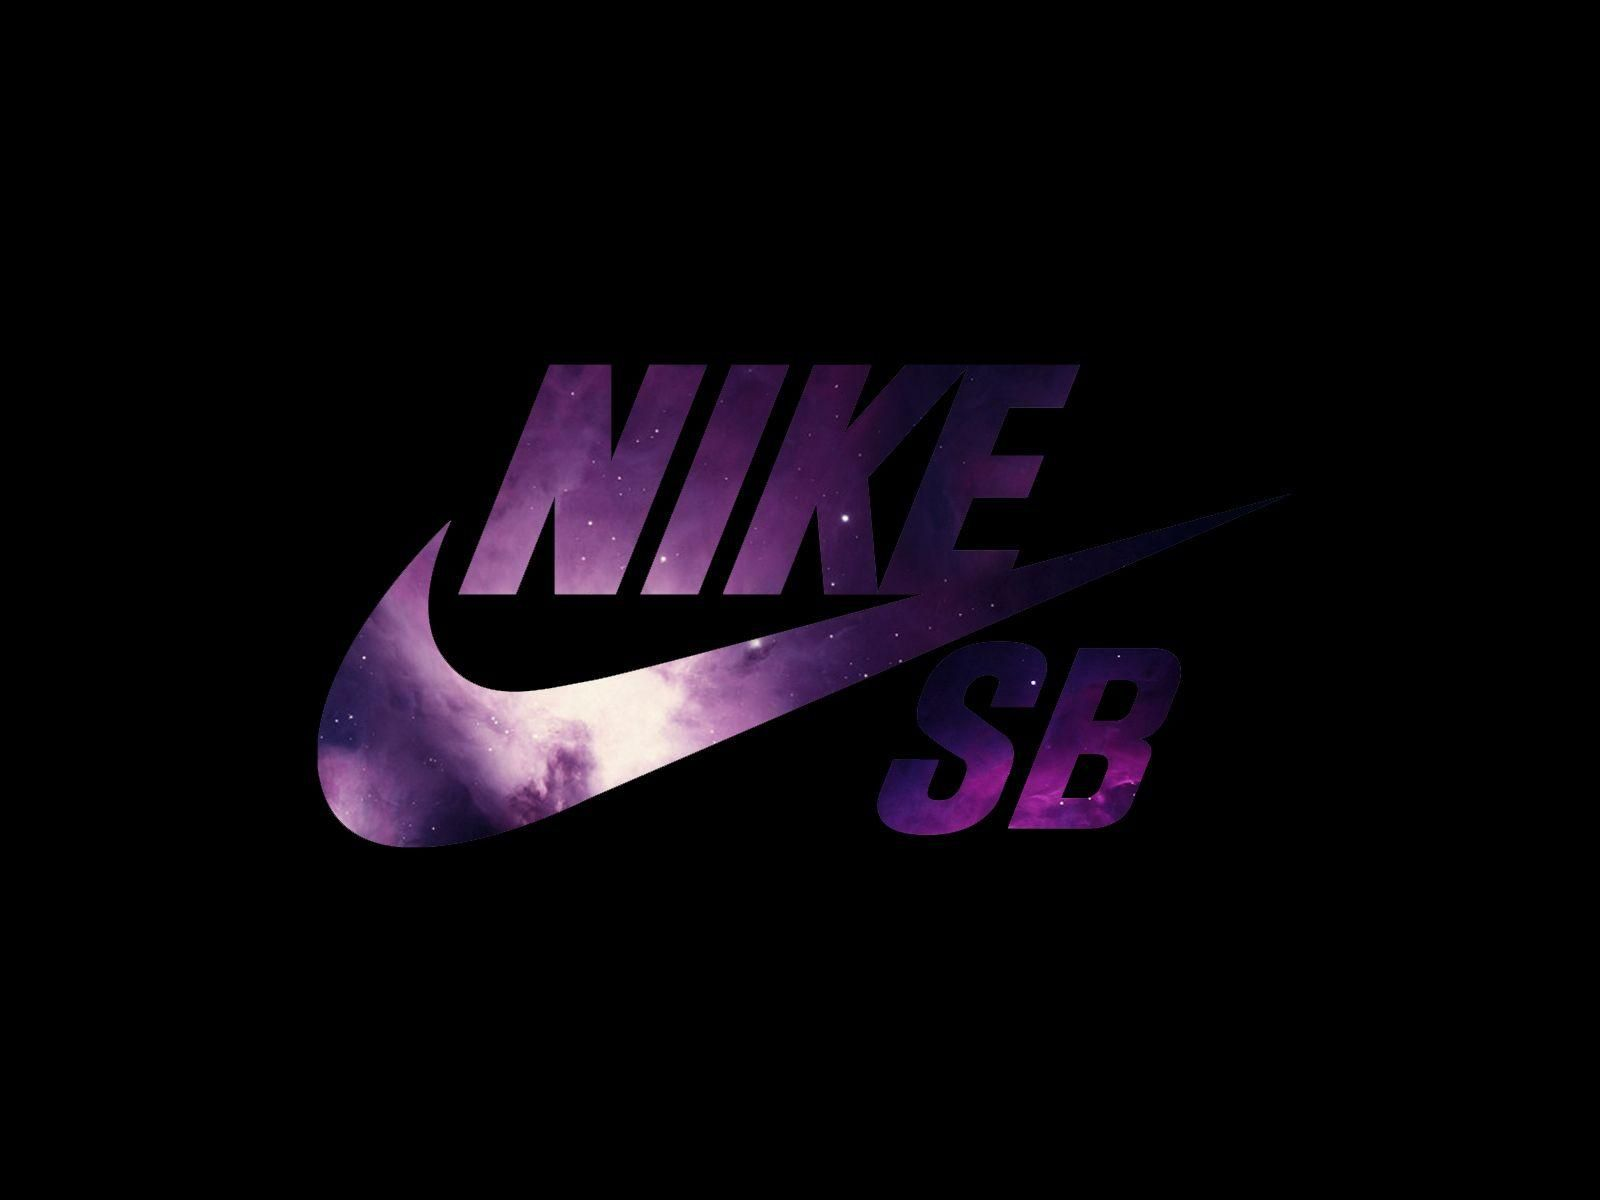 Nike SB Wallpapers - Top Free Nike SB